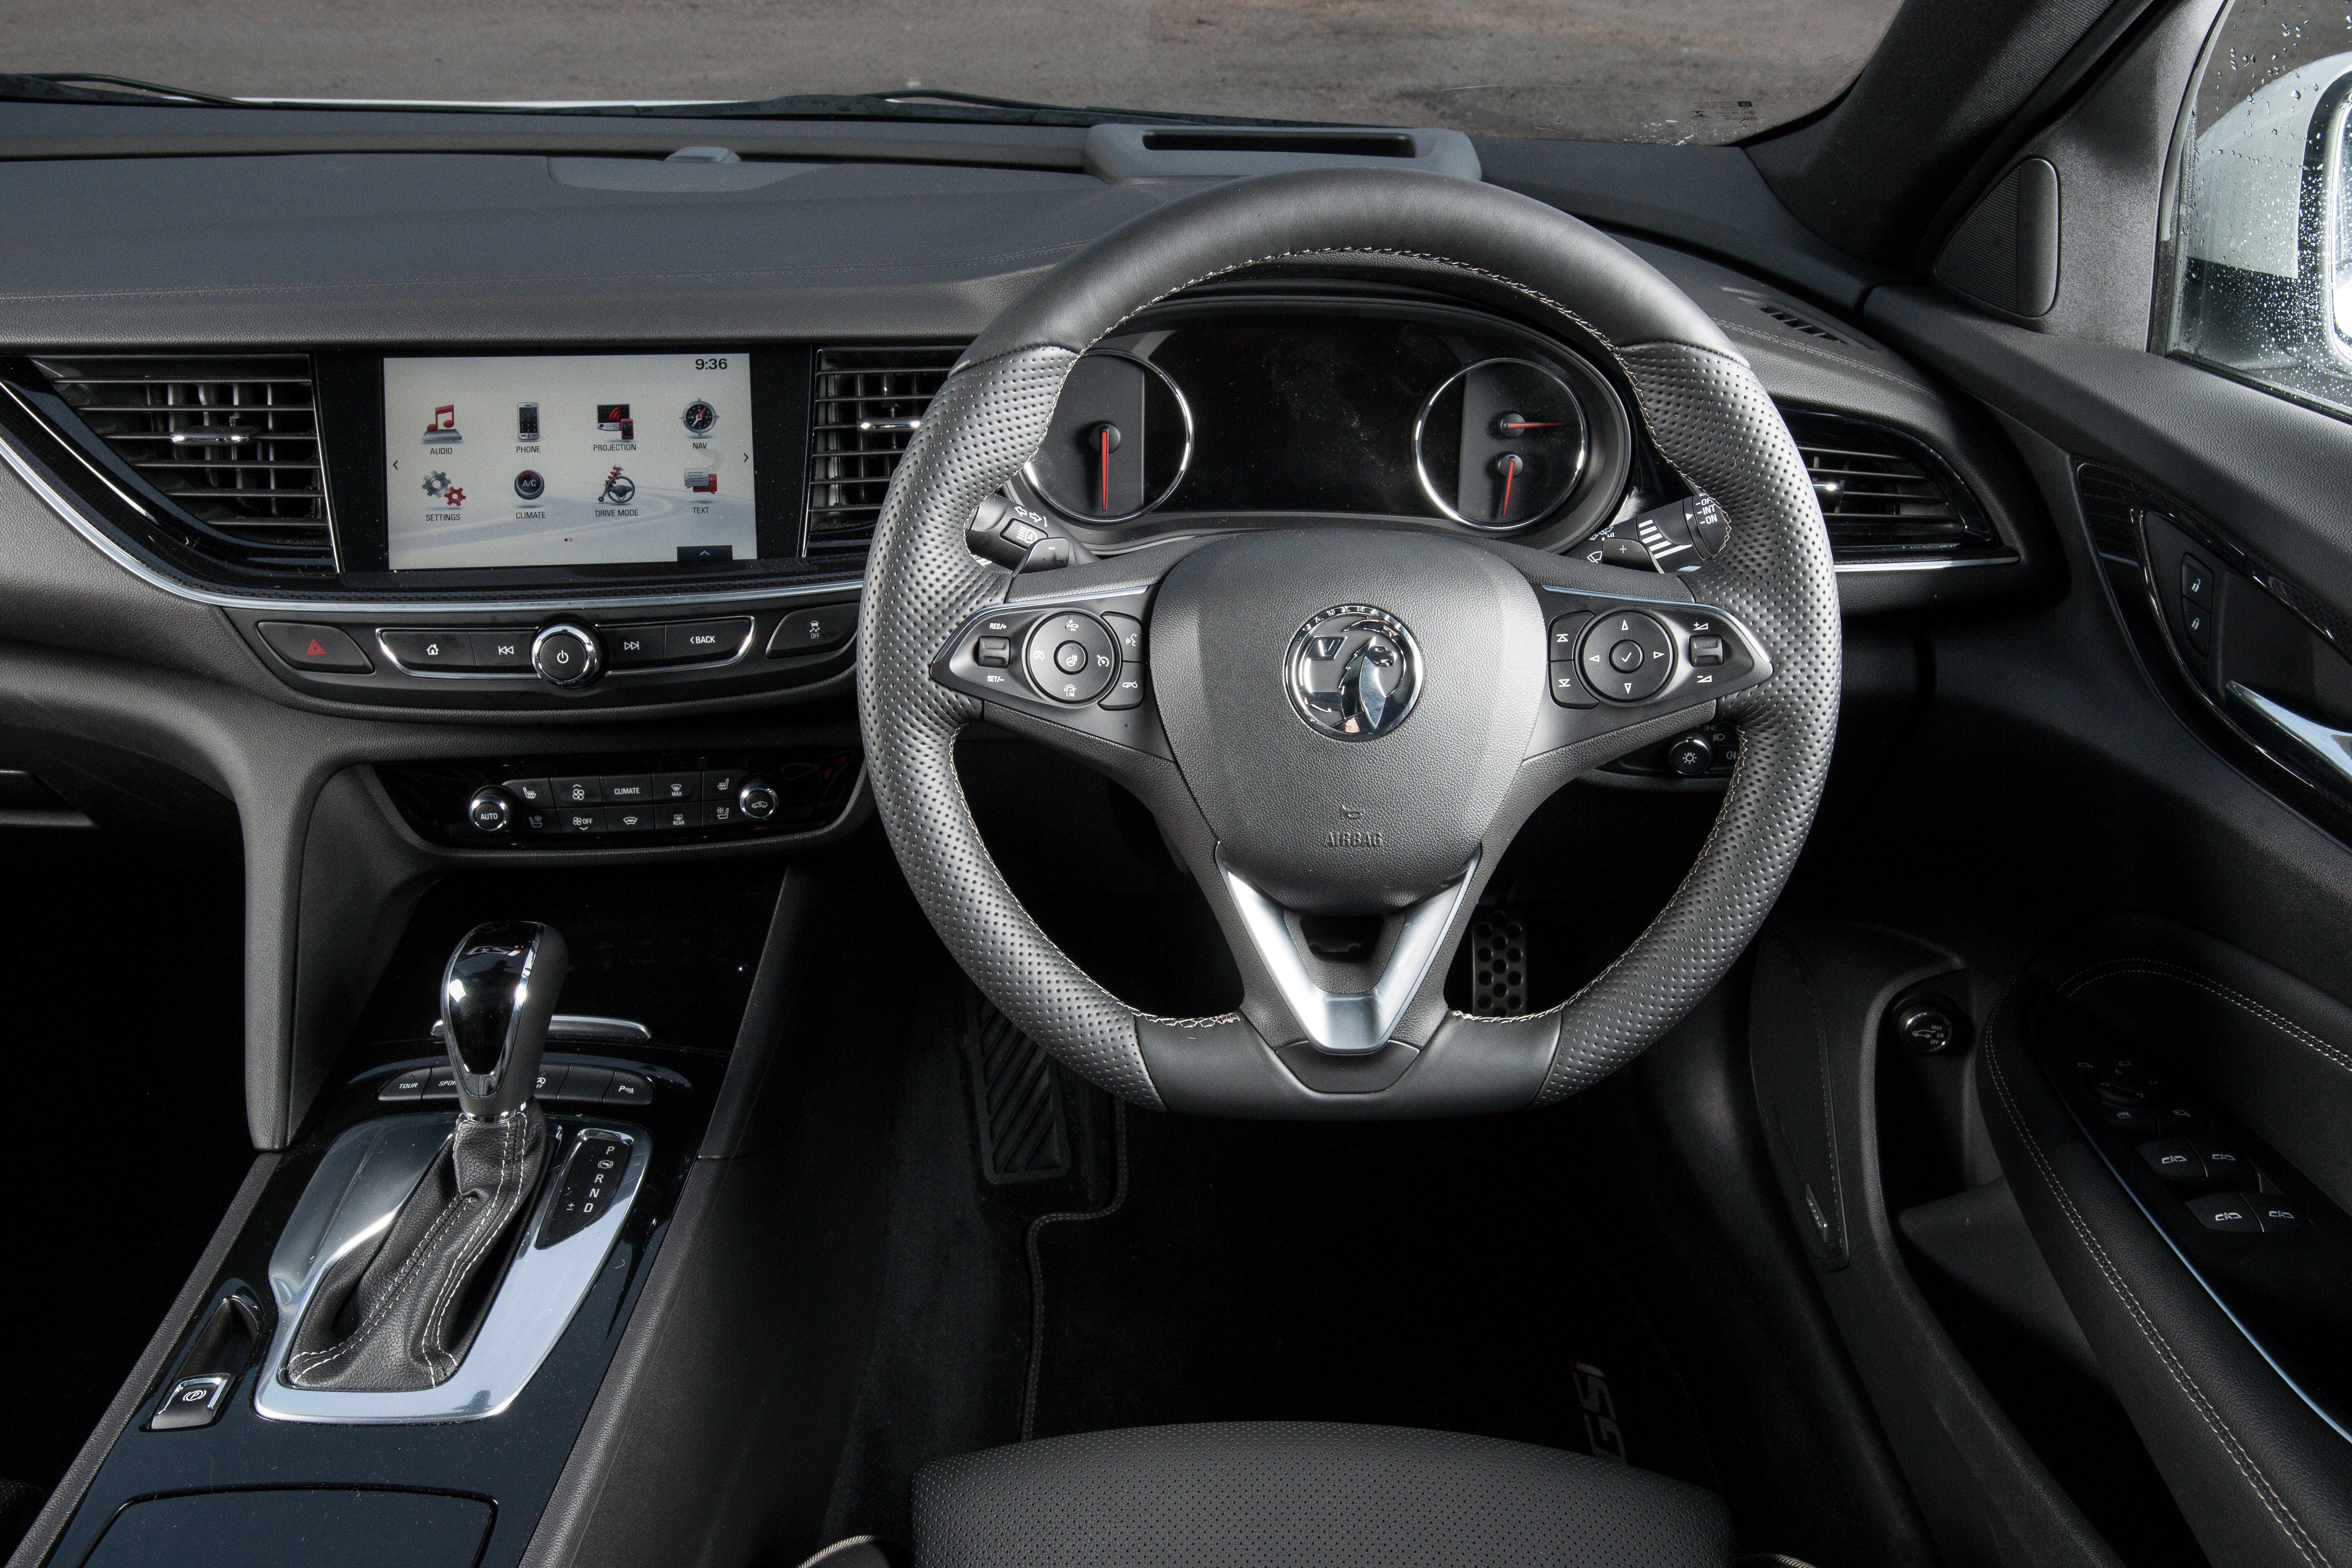 Vauxhall Insignia Grand Sport Driver's Seat